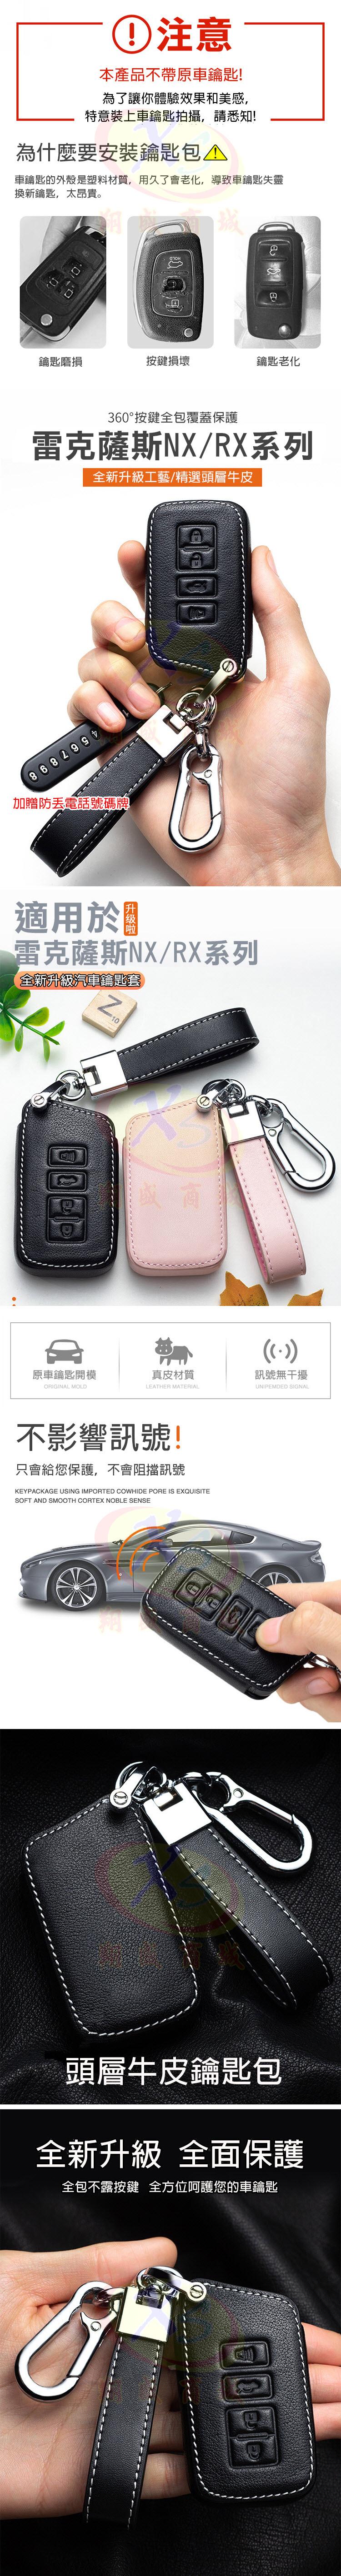 LEXUS 淩志 NX200/RX300 汽車真皮鑰匙包 鑰匙套 皮革遙控器保護套 贈防丟數字電話吊牌